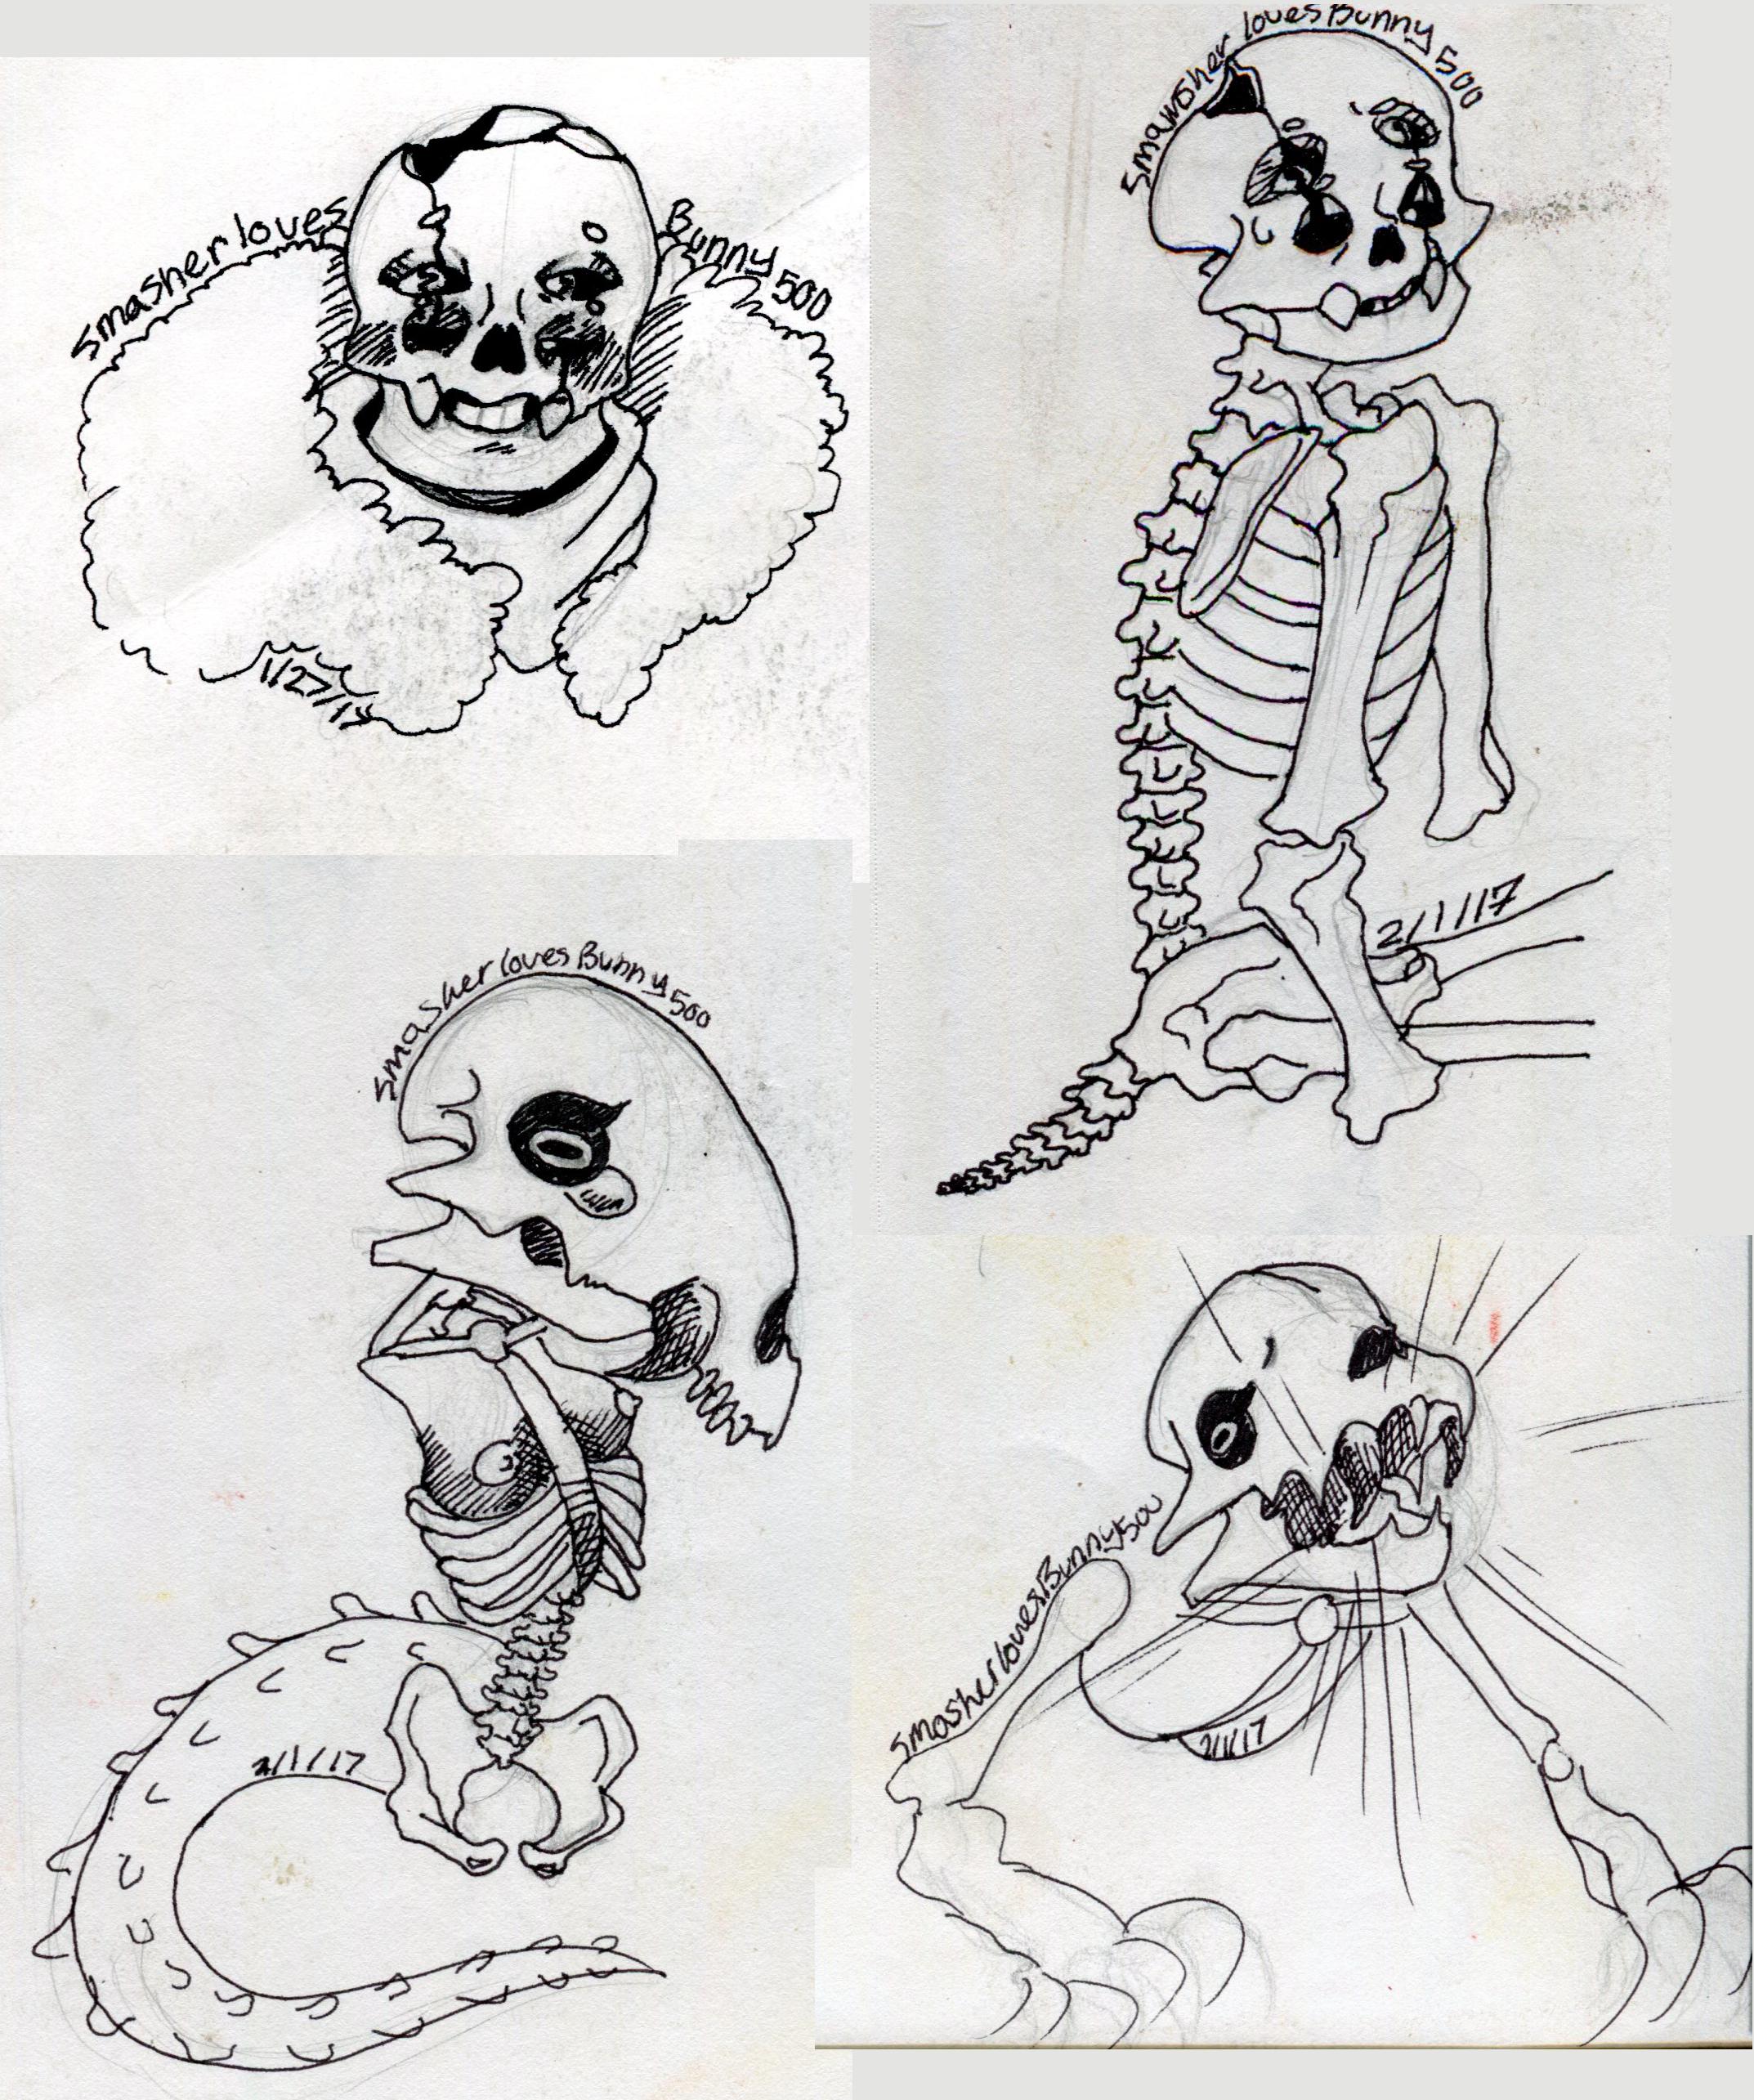 sketch Dump 2 by SmasherlovesBunny500